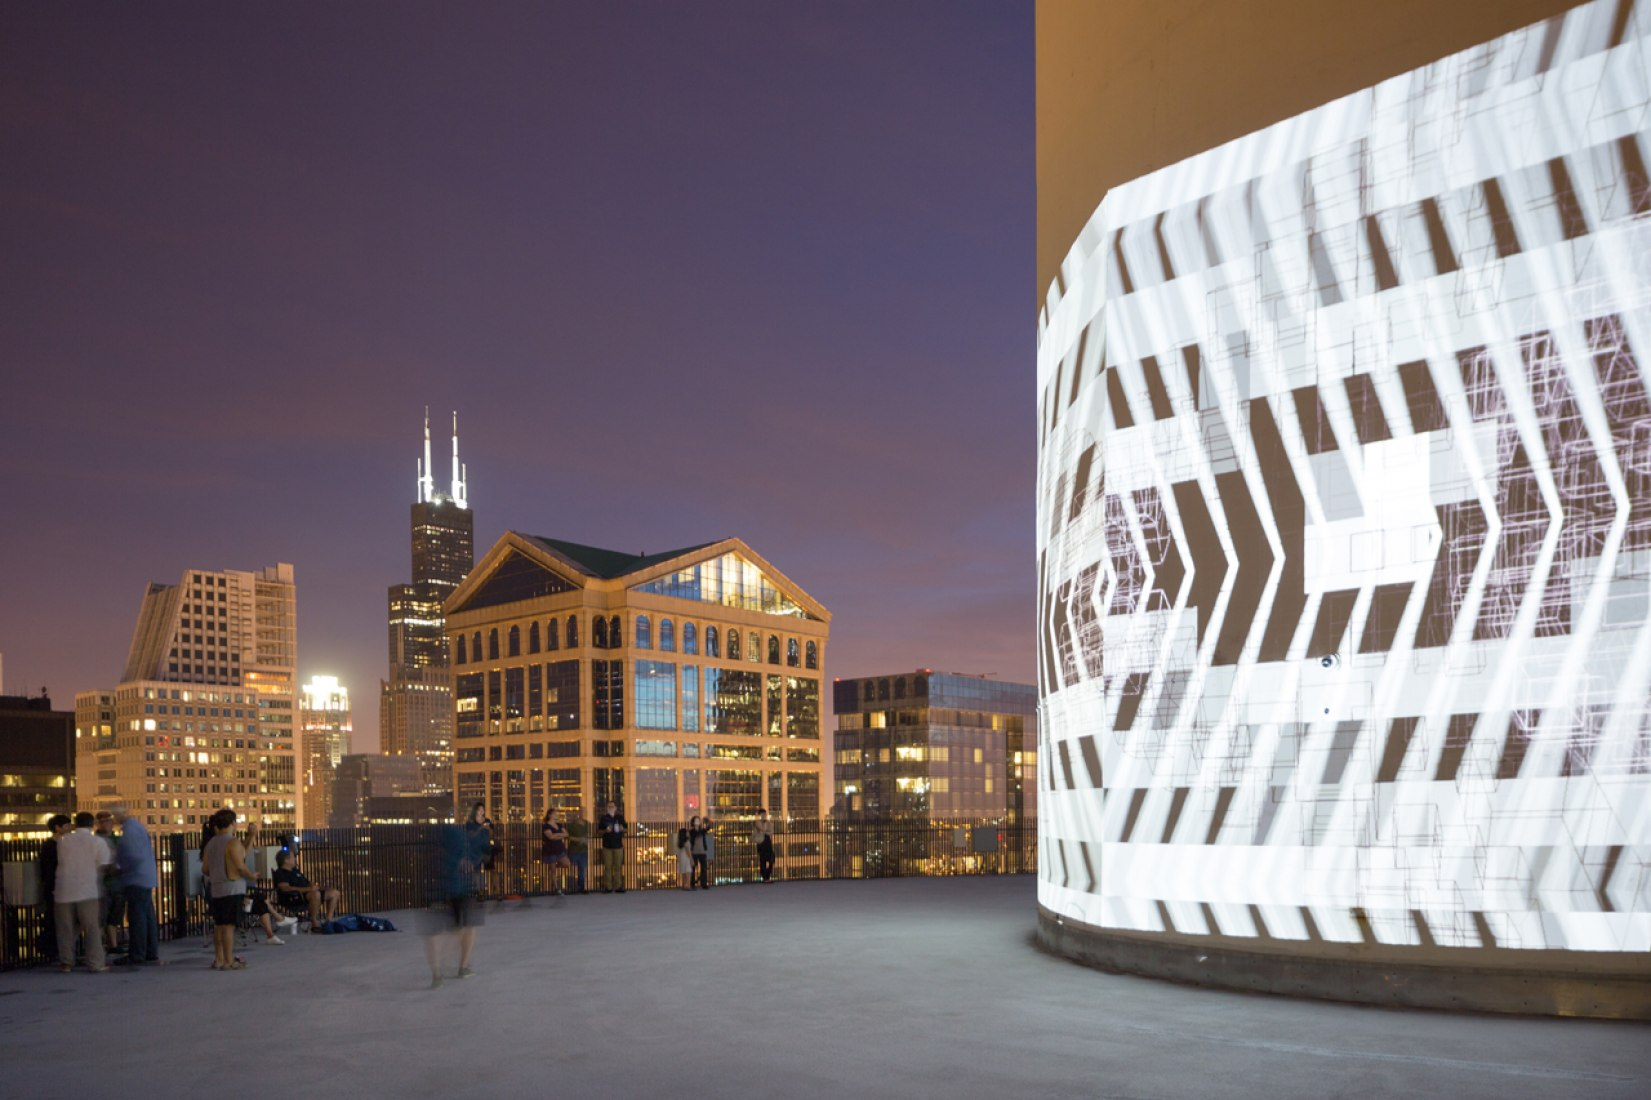 MAS Context x Luftwerk x Marina City (Chicago, Illinois), 2014. Fotografía © David Schalliol. Cortesía de MAS Context